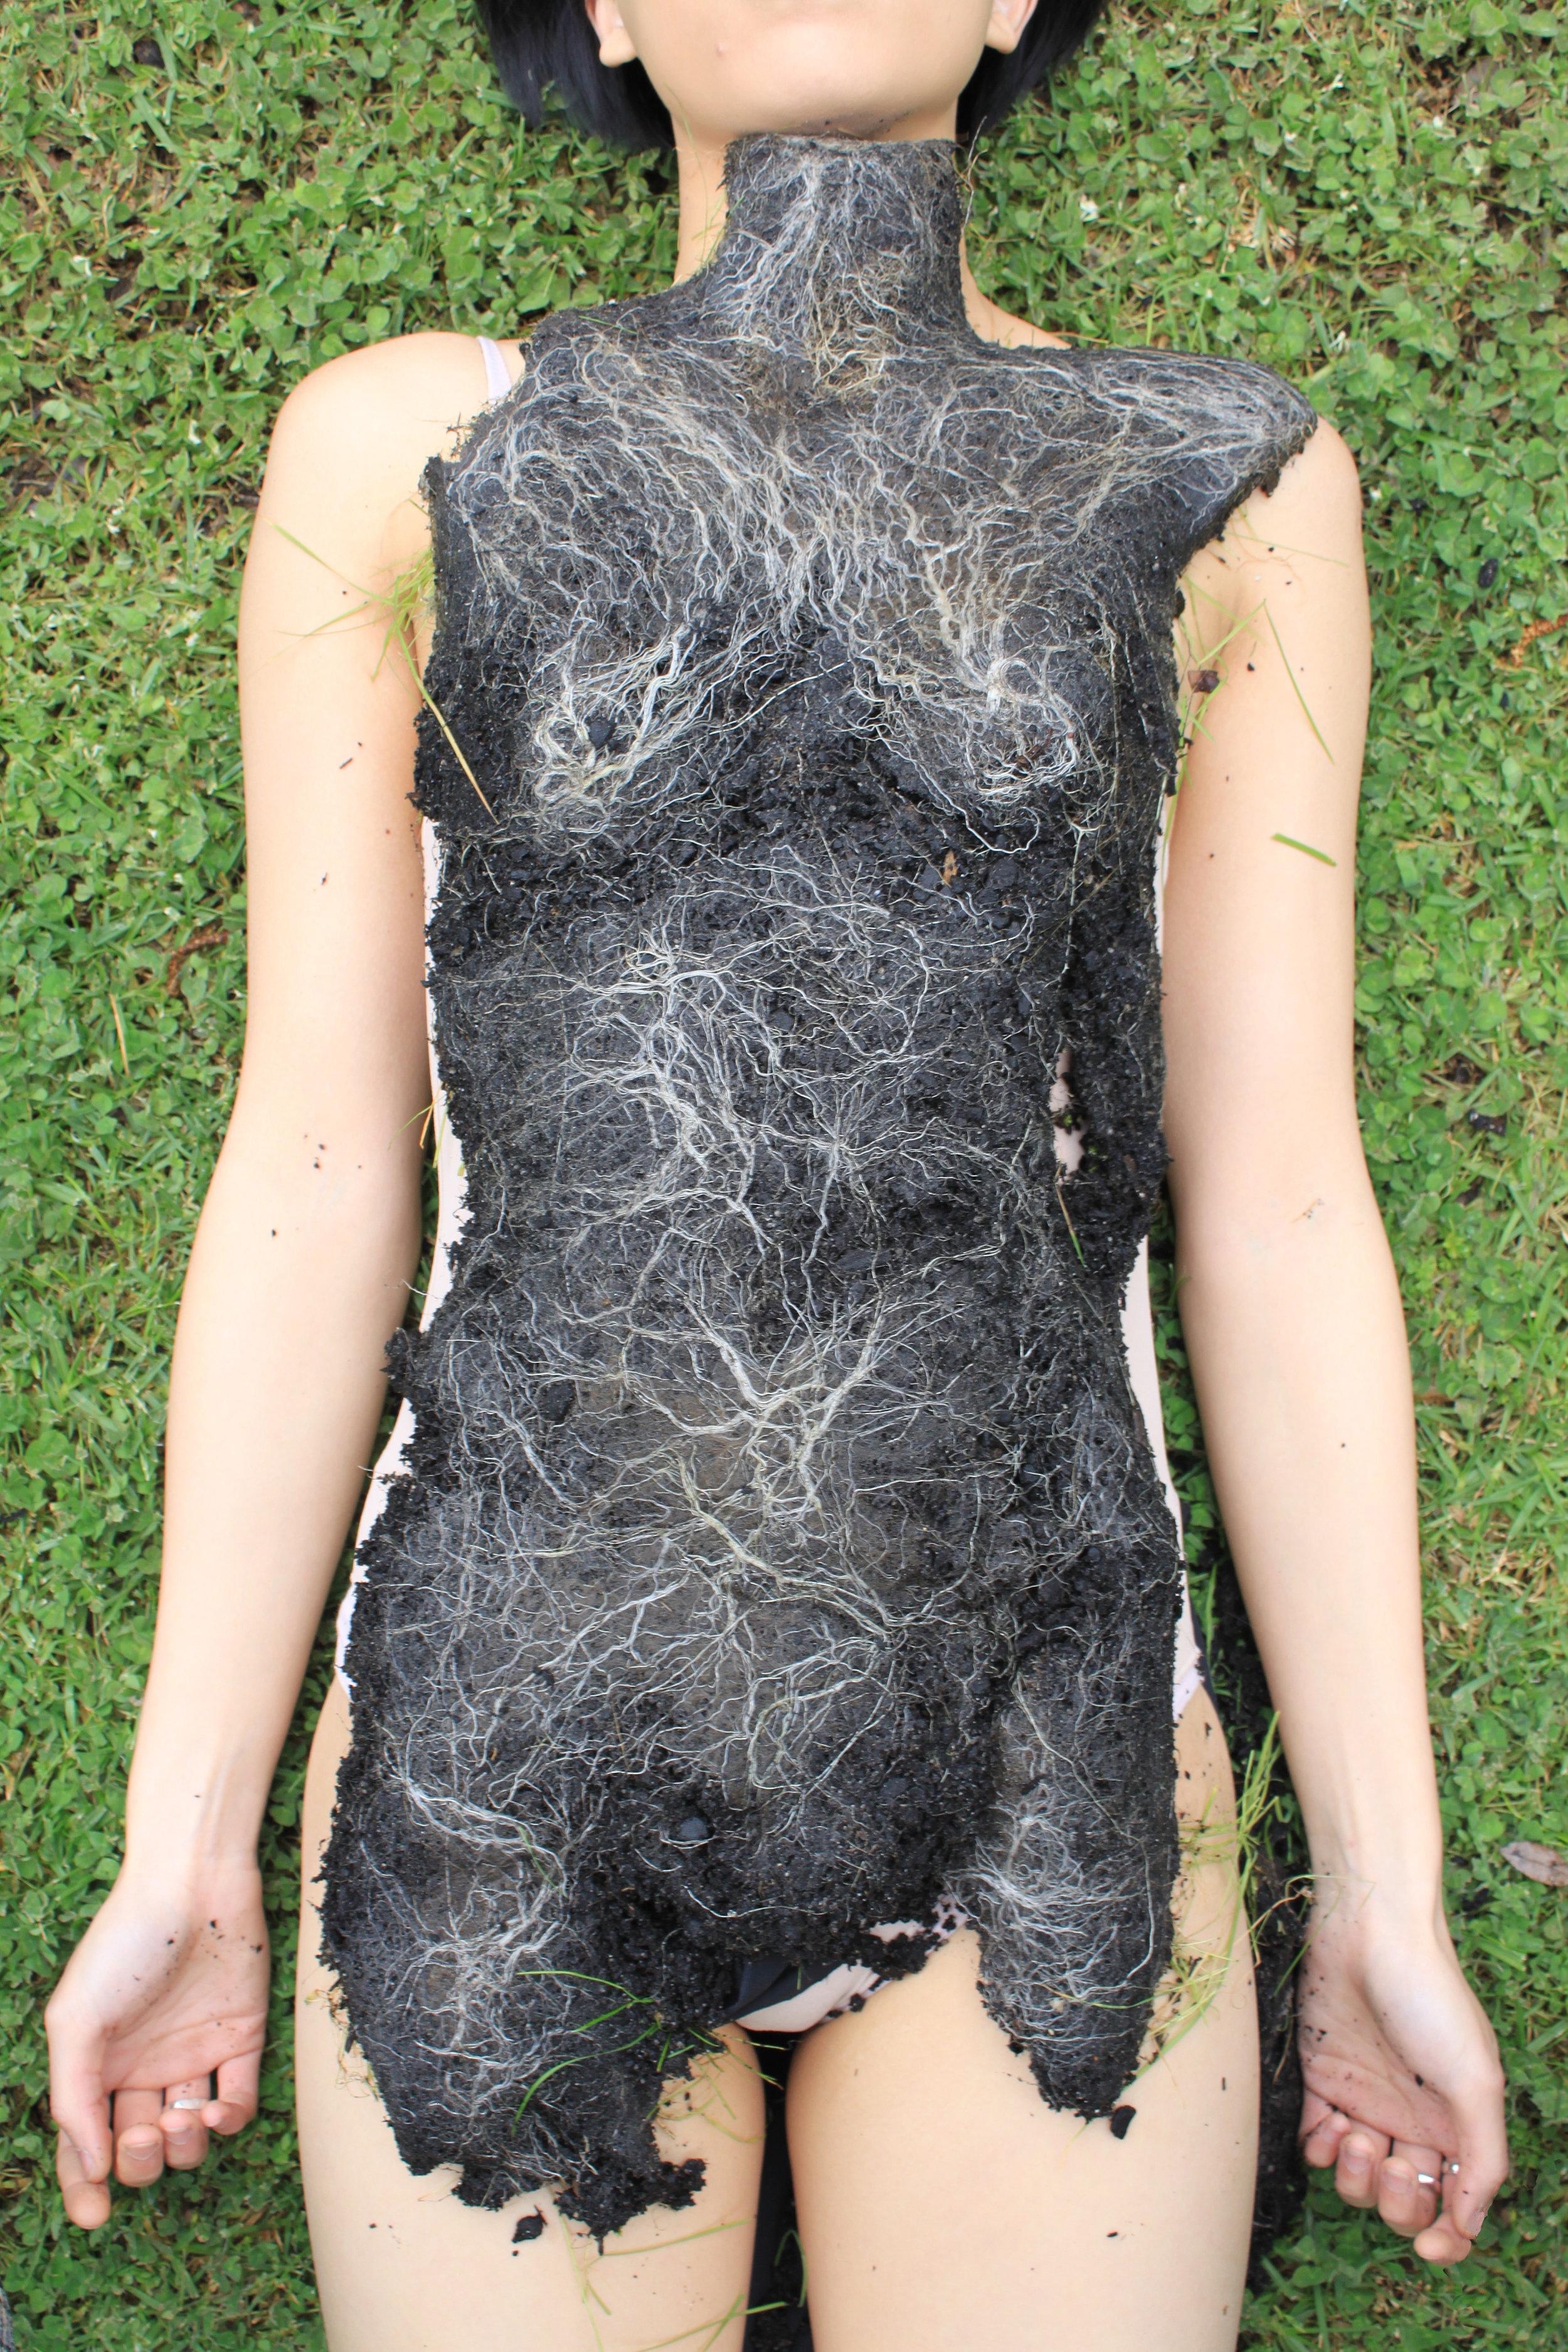 Body Moulds: The Body Becomes Landscape  Pia Interlandi